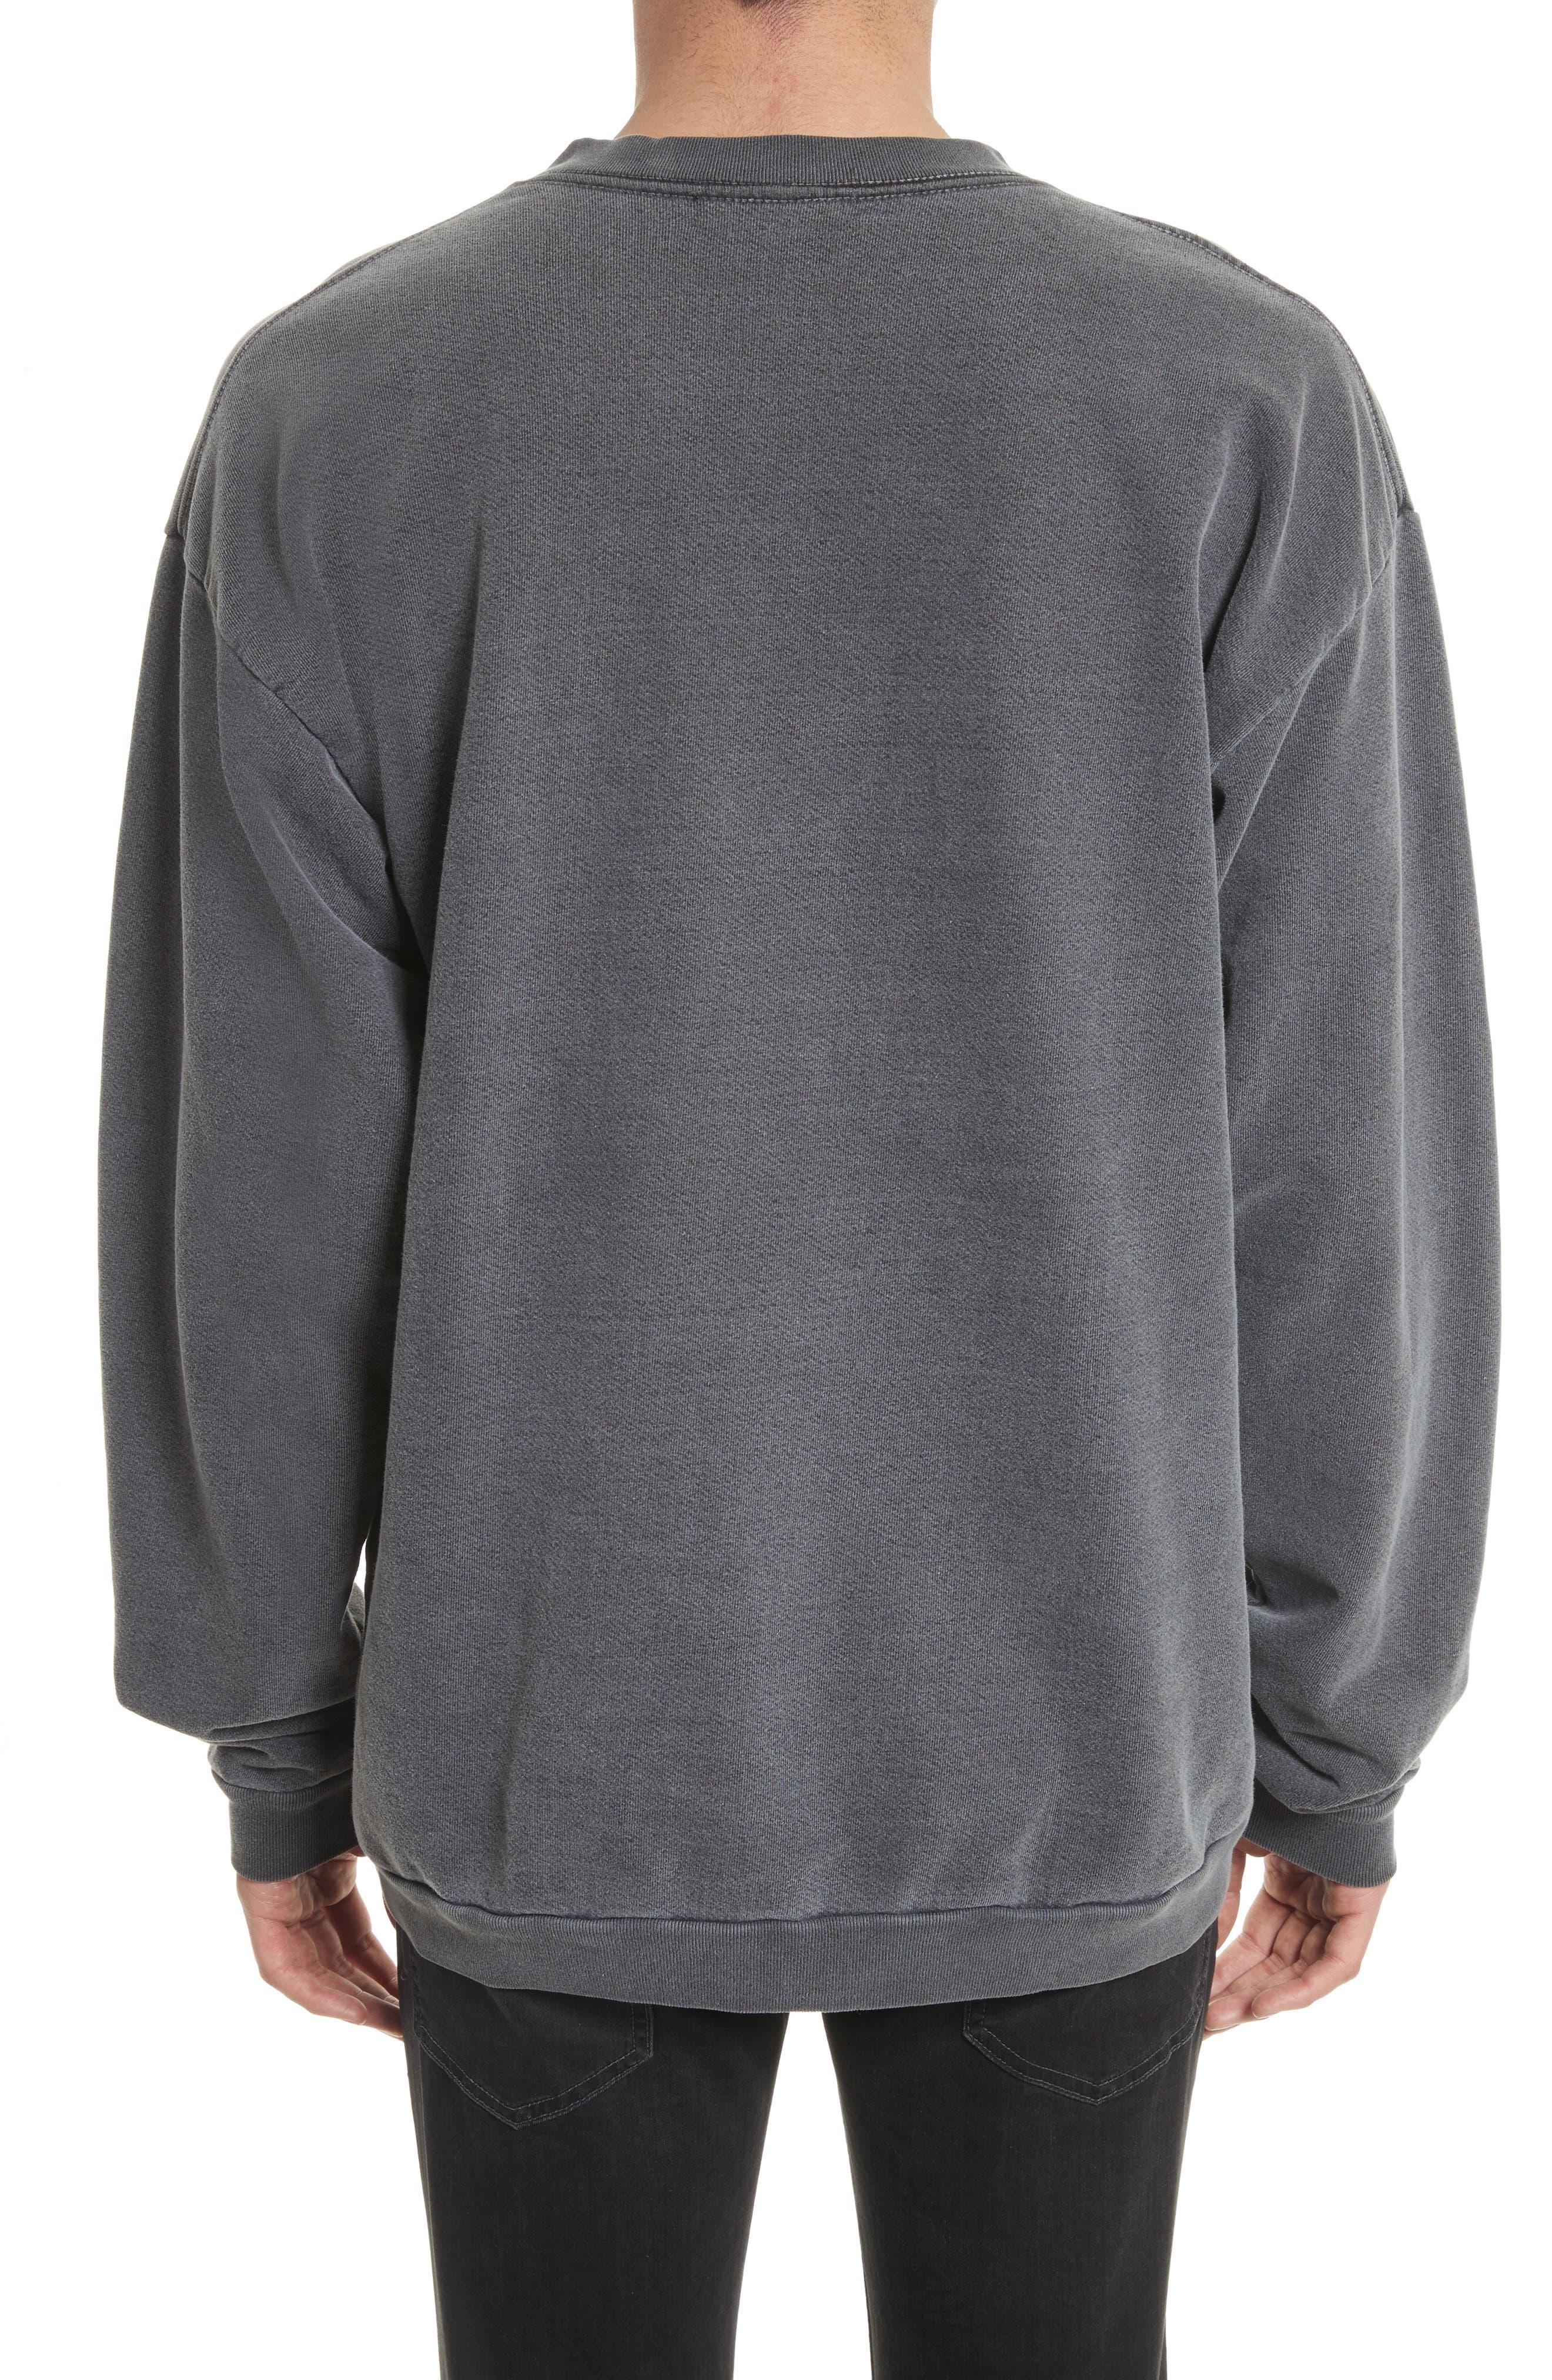 Norton Sweatshirt,                             Alternate thumbnail 2, color,                             001